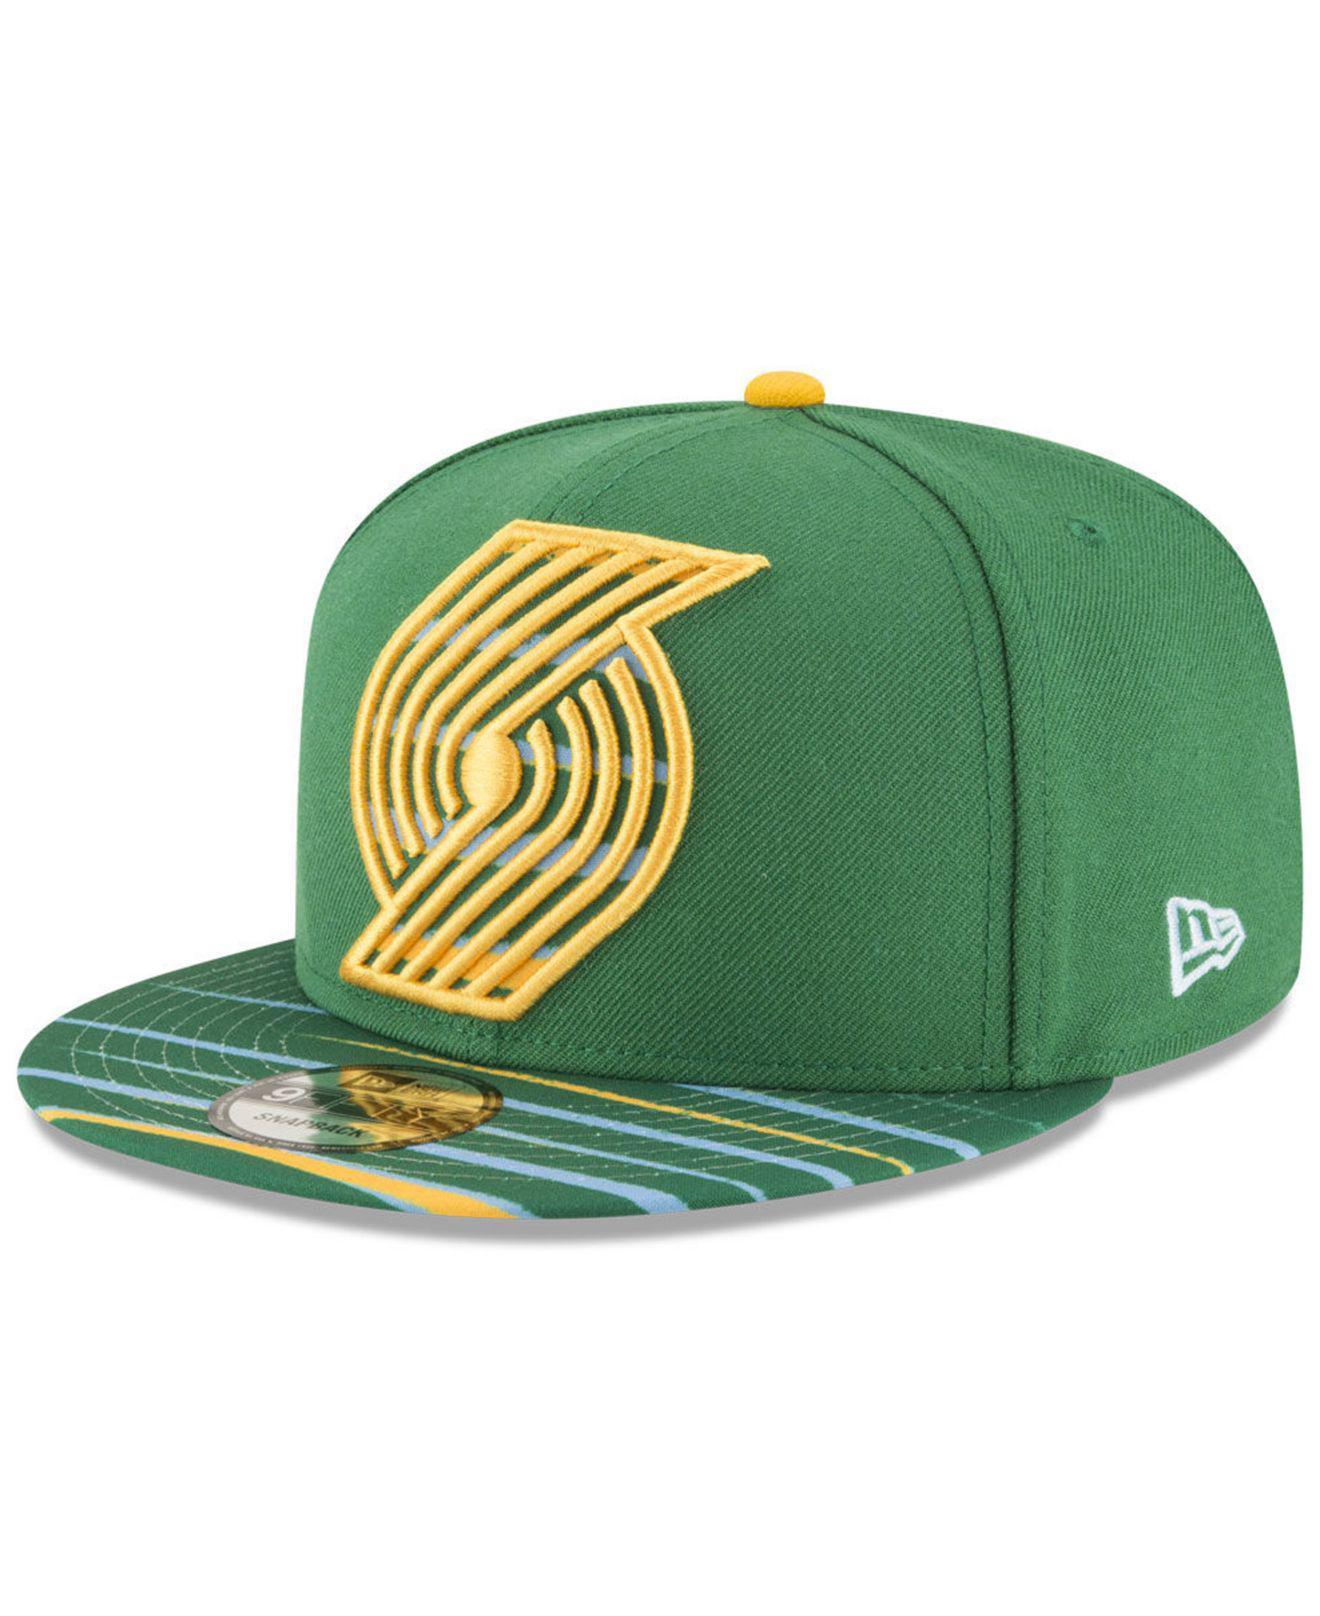 best loved 4b8bd 6fd3b ... sweden portland trail blazers city flag 9fifty snapback cap for men lyst.  view fullscreen 0d036